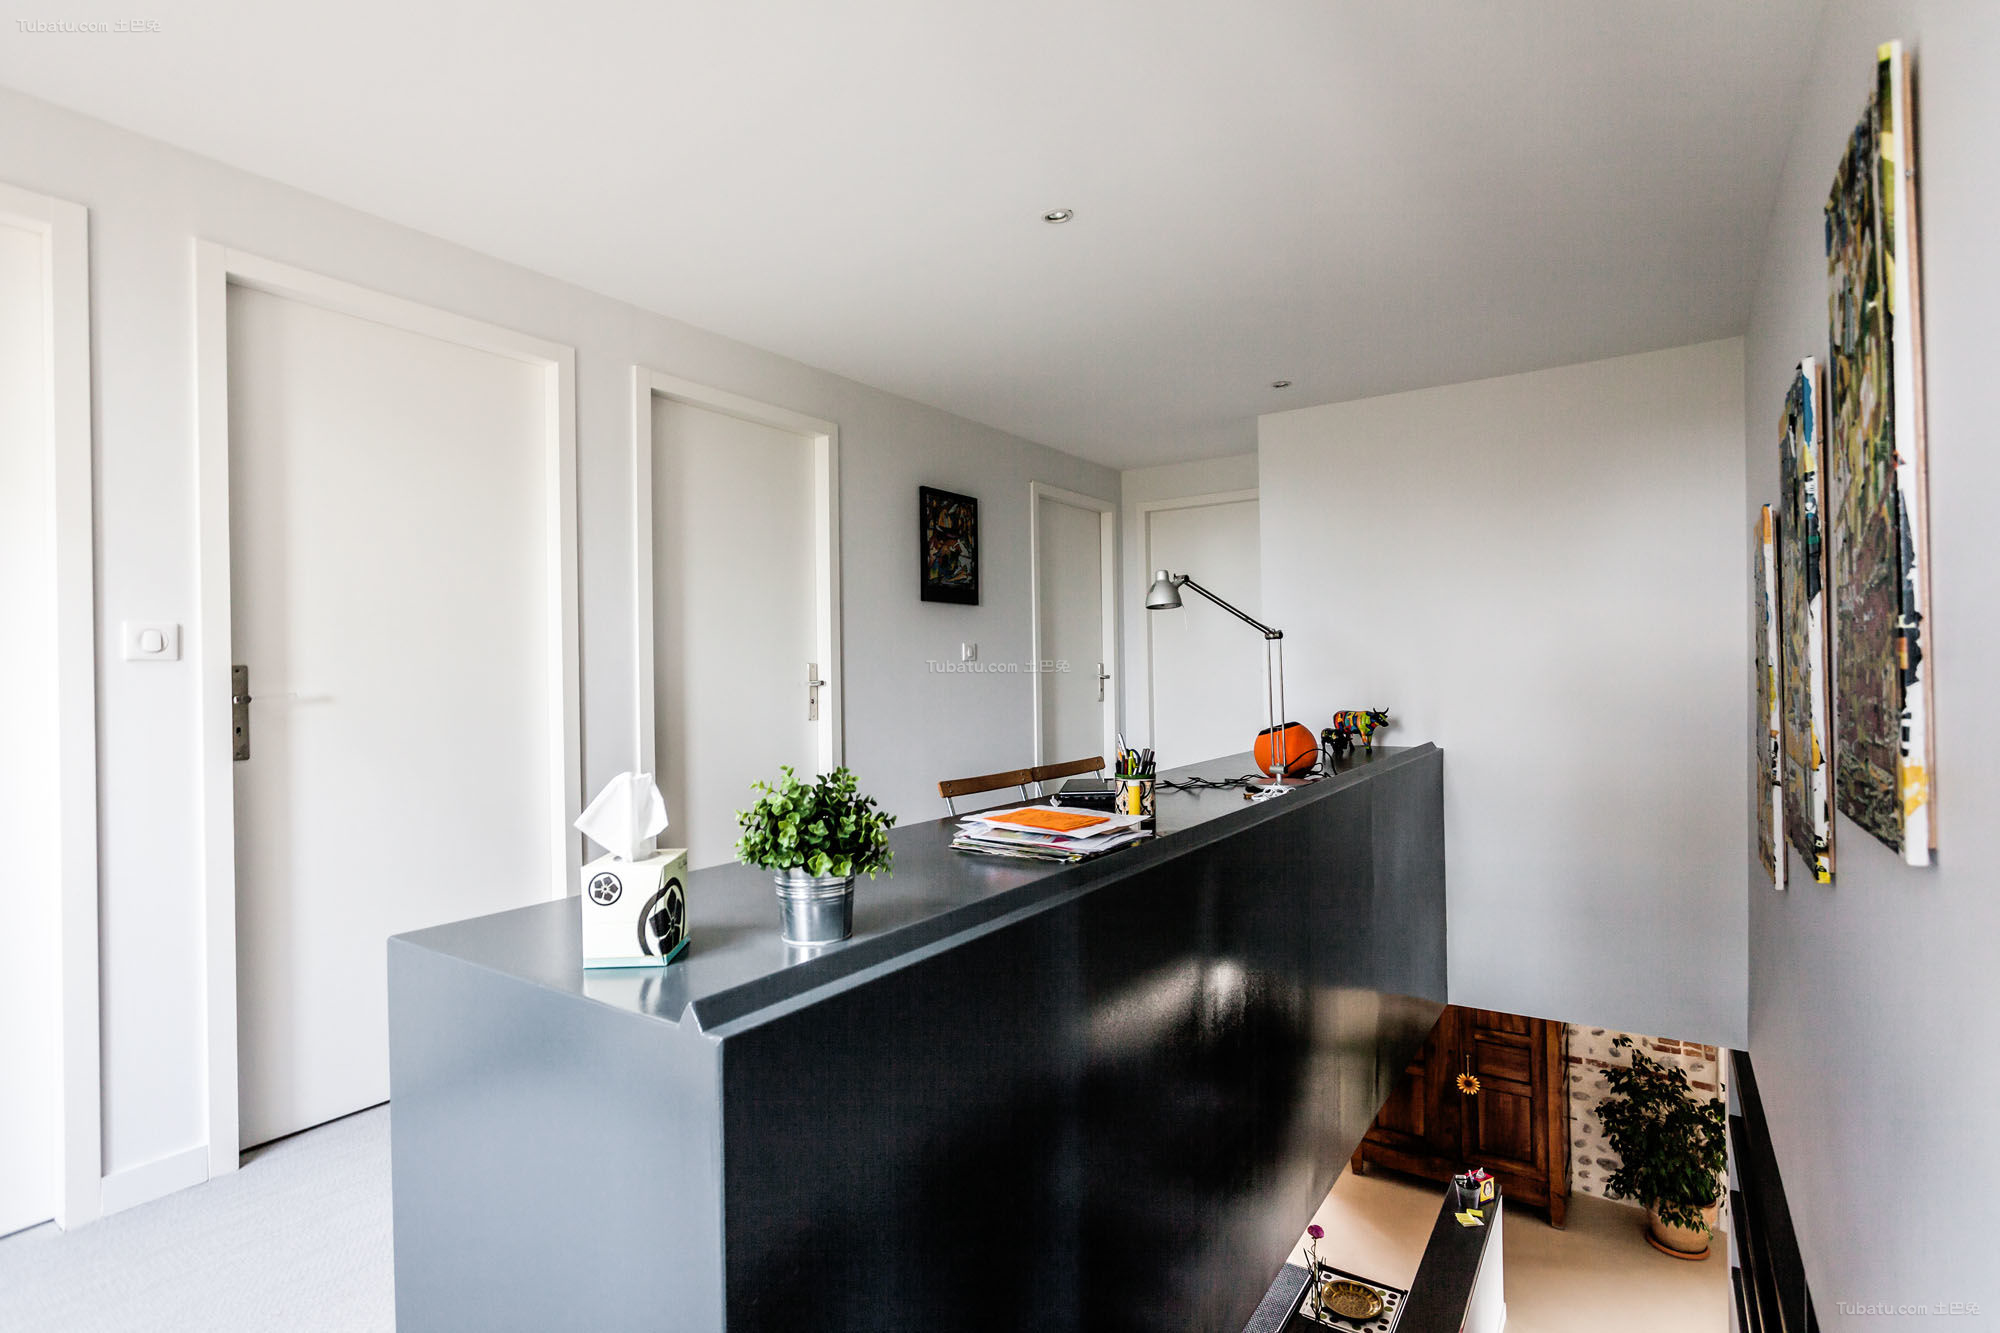 loft风格复古低调厨房图